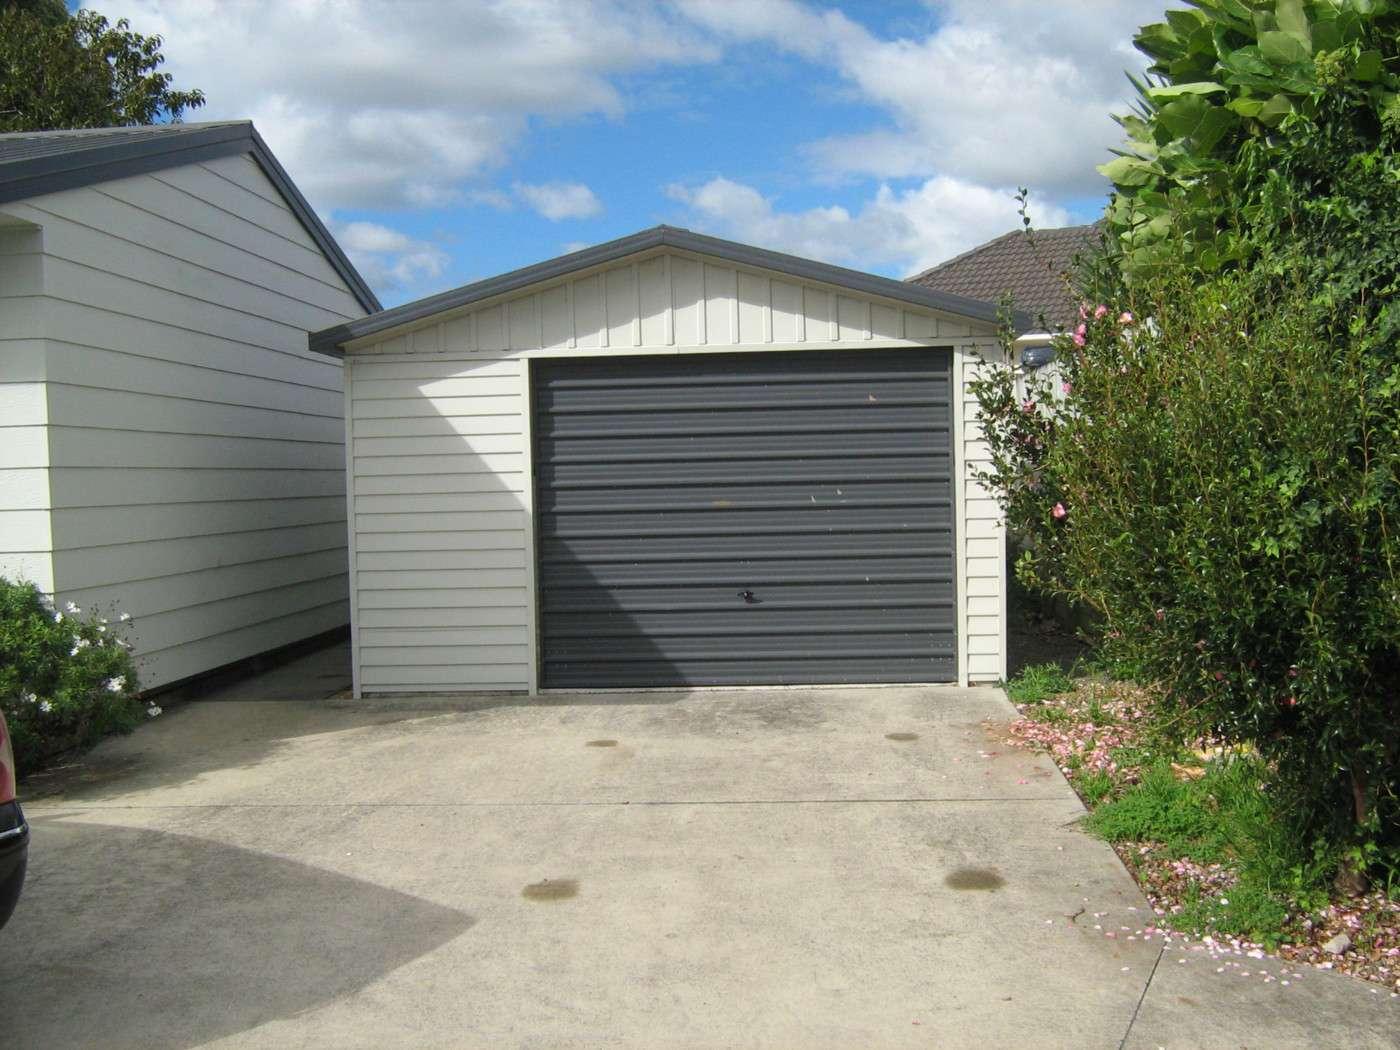 9B Surrey Grove, PARKVALE, Tauranga City 3112